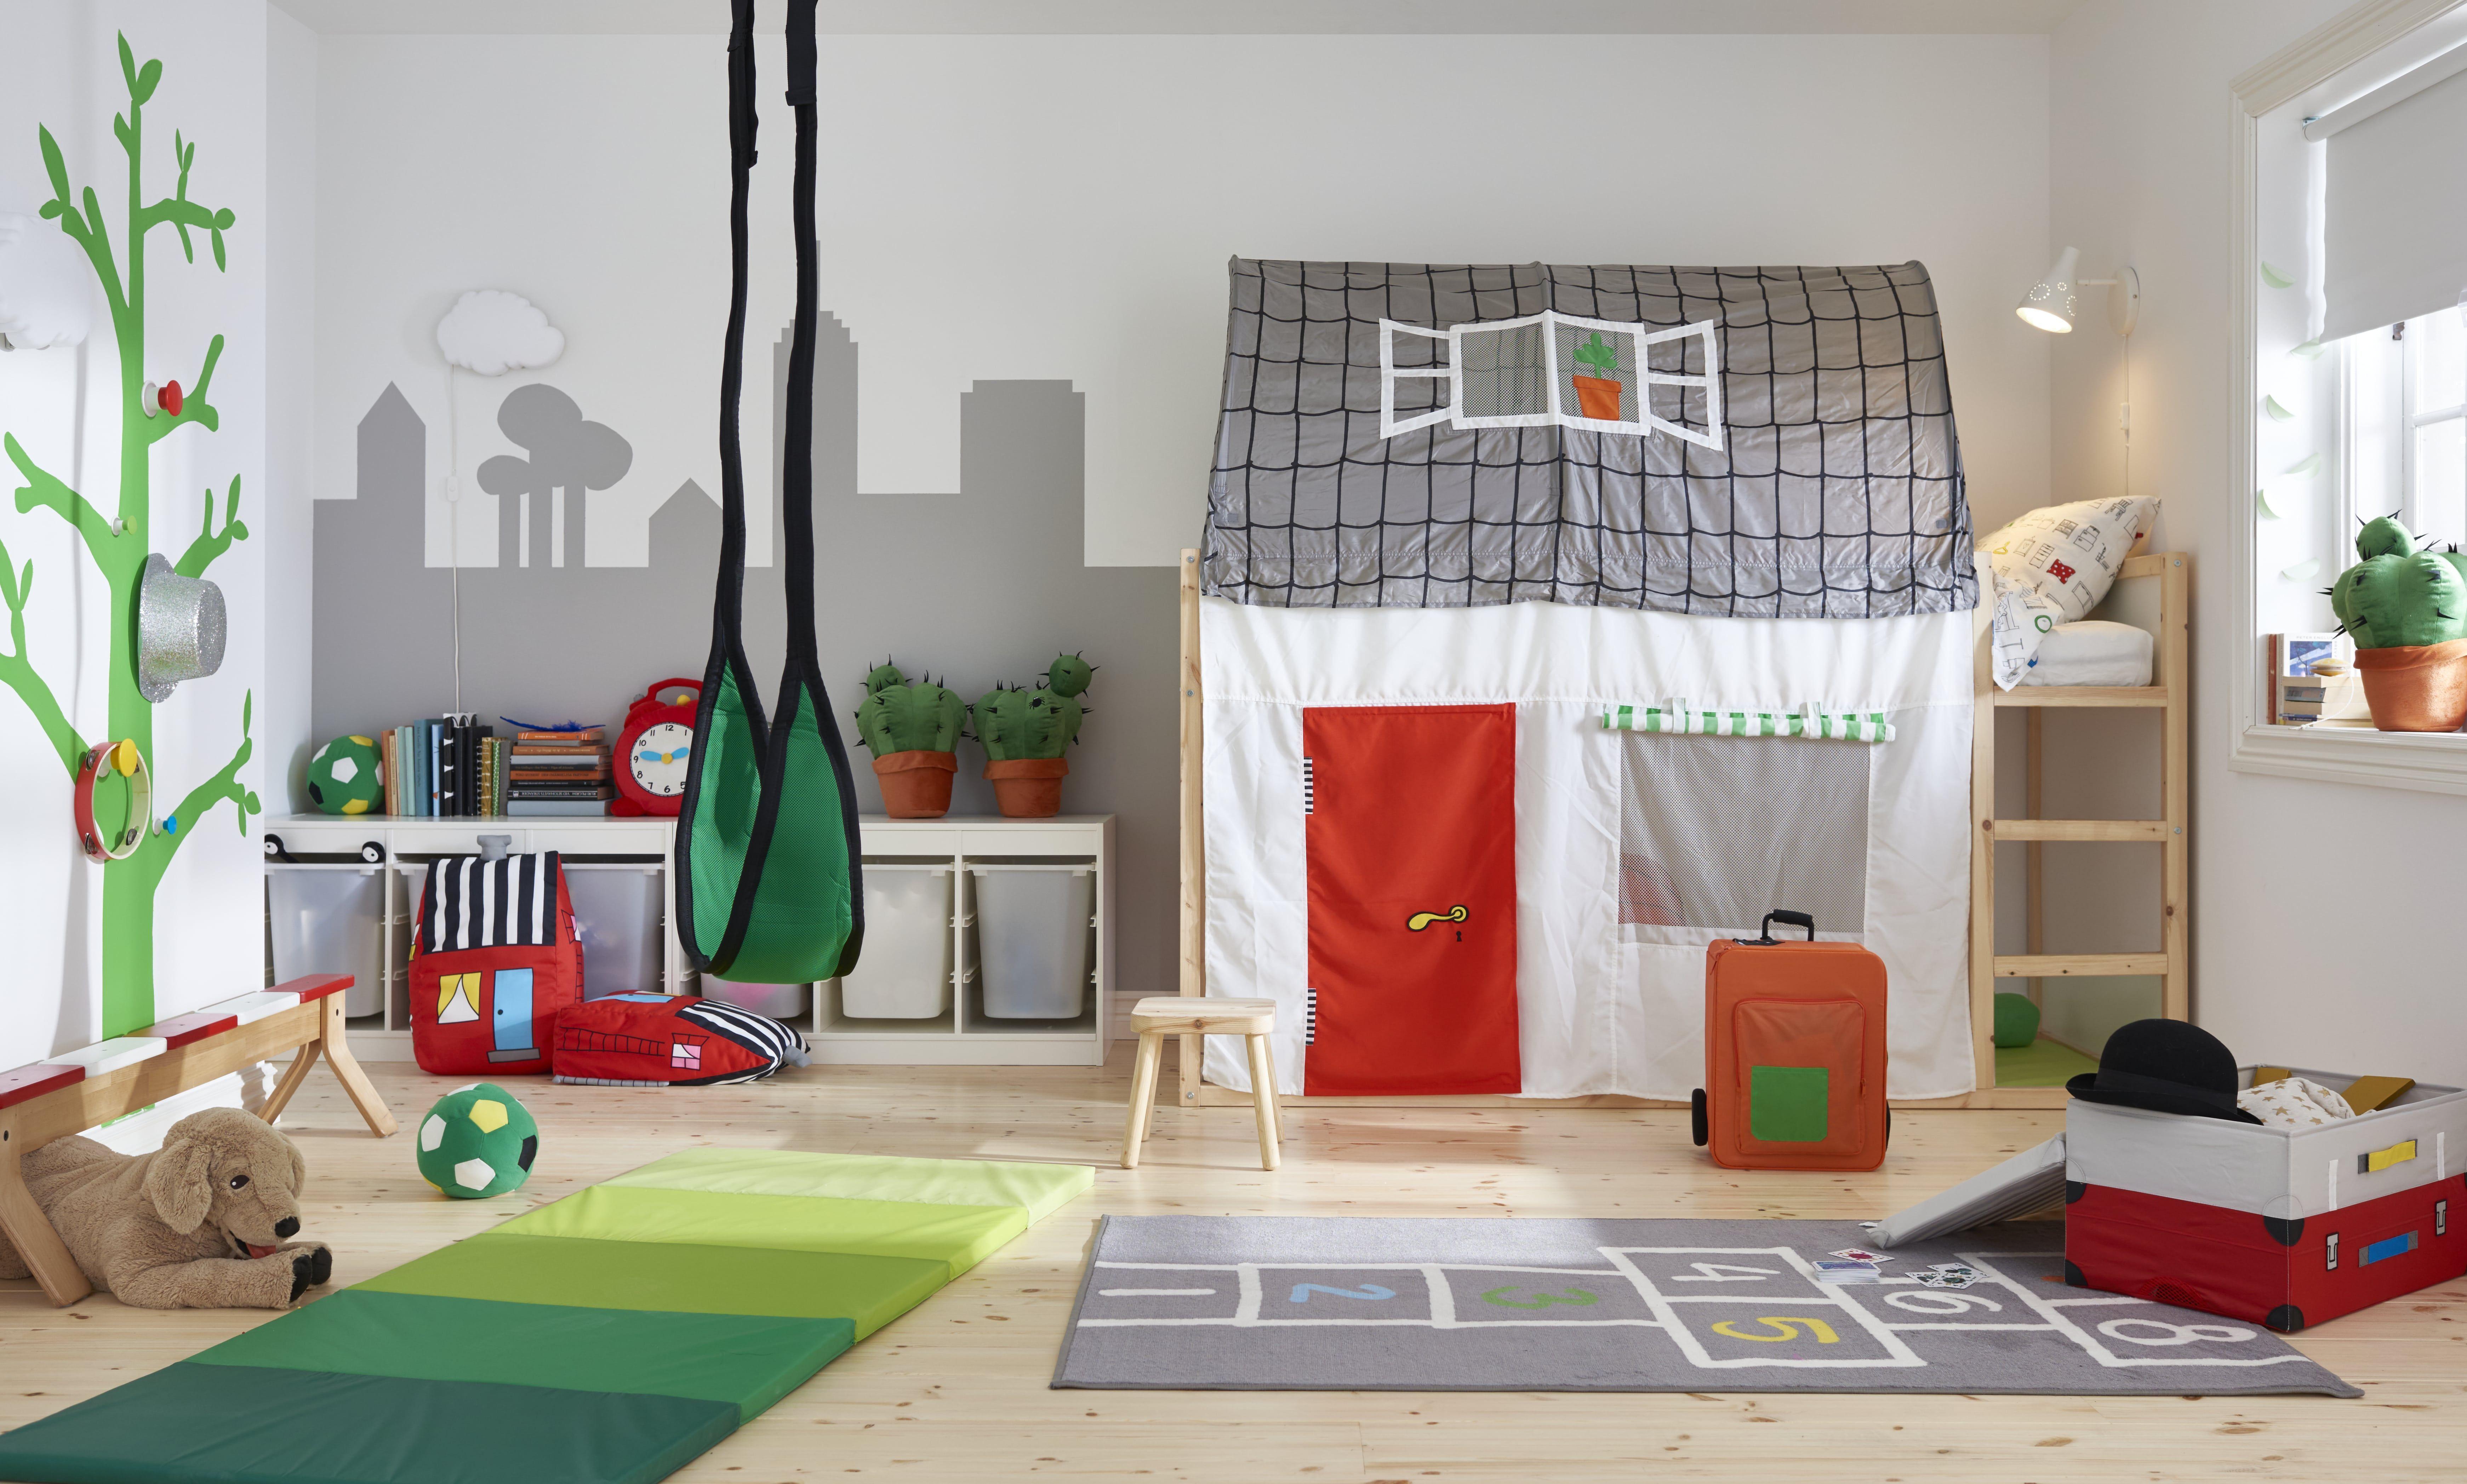 Hemmahos Alfombra Gris 100x160 Cm Ikea Kinder Zimmer Kinderzimmer Ikea Kinderzimmer